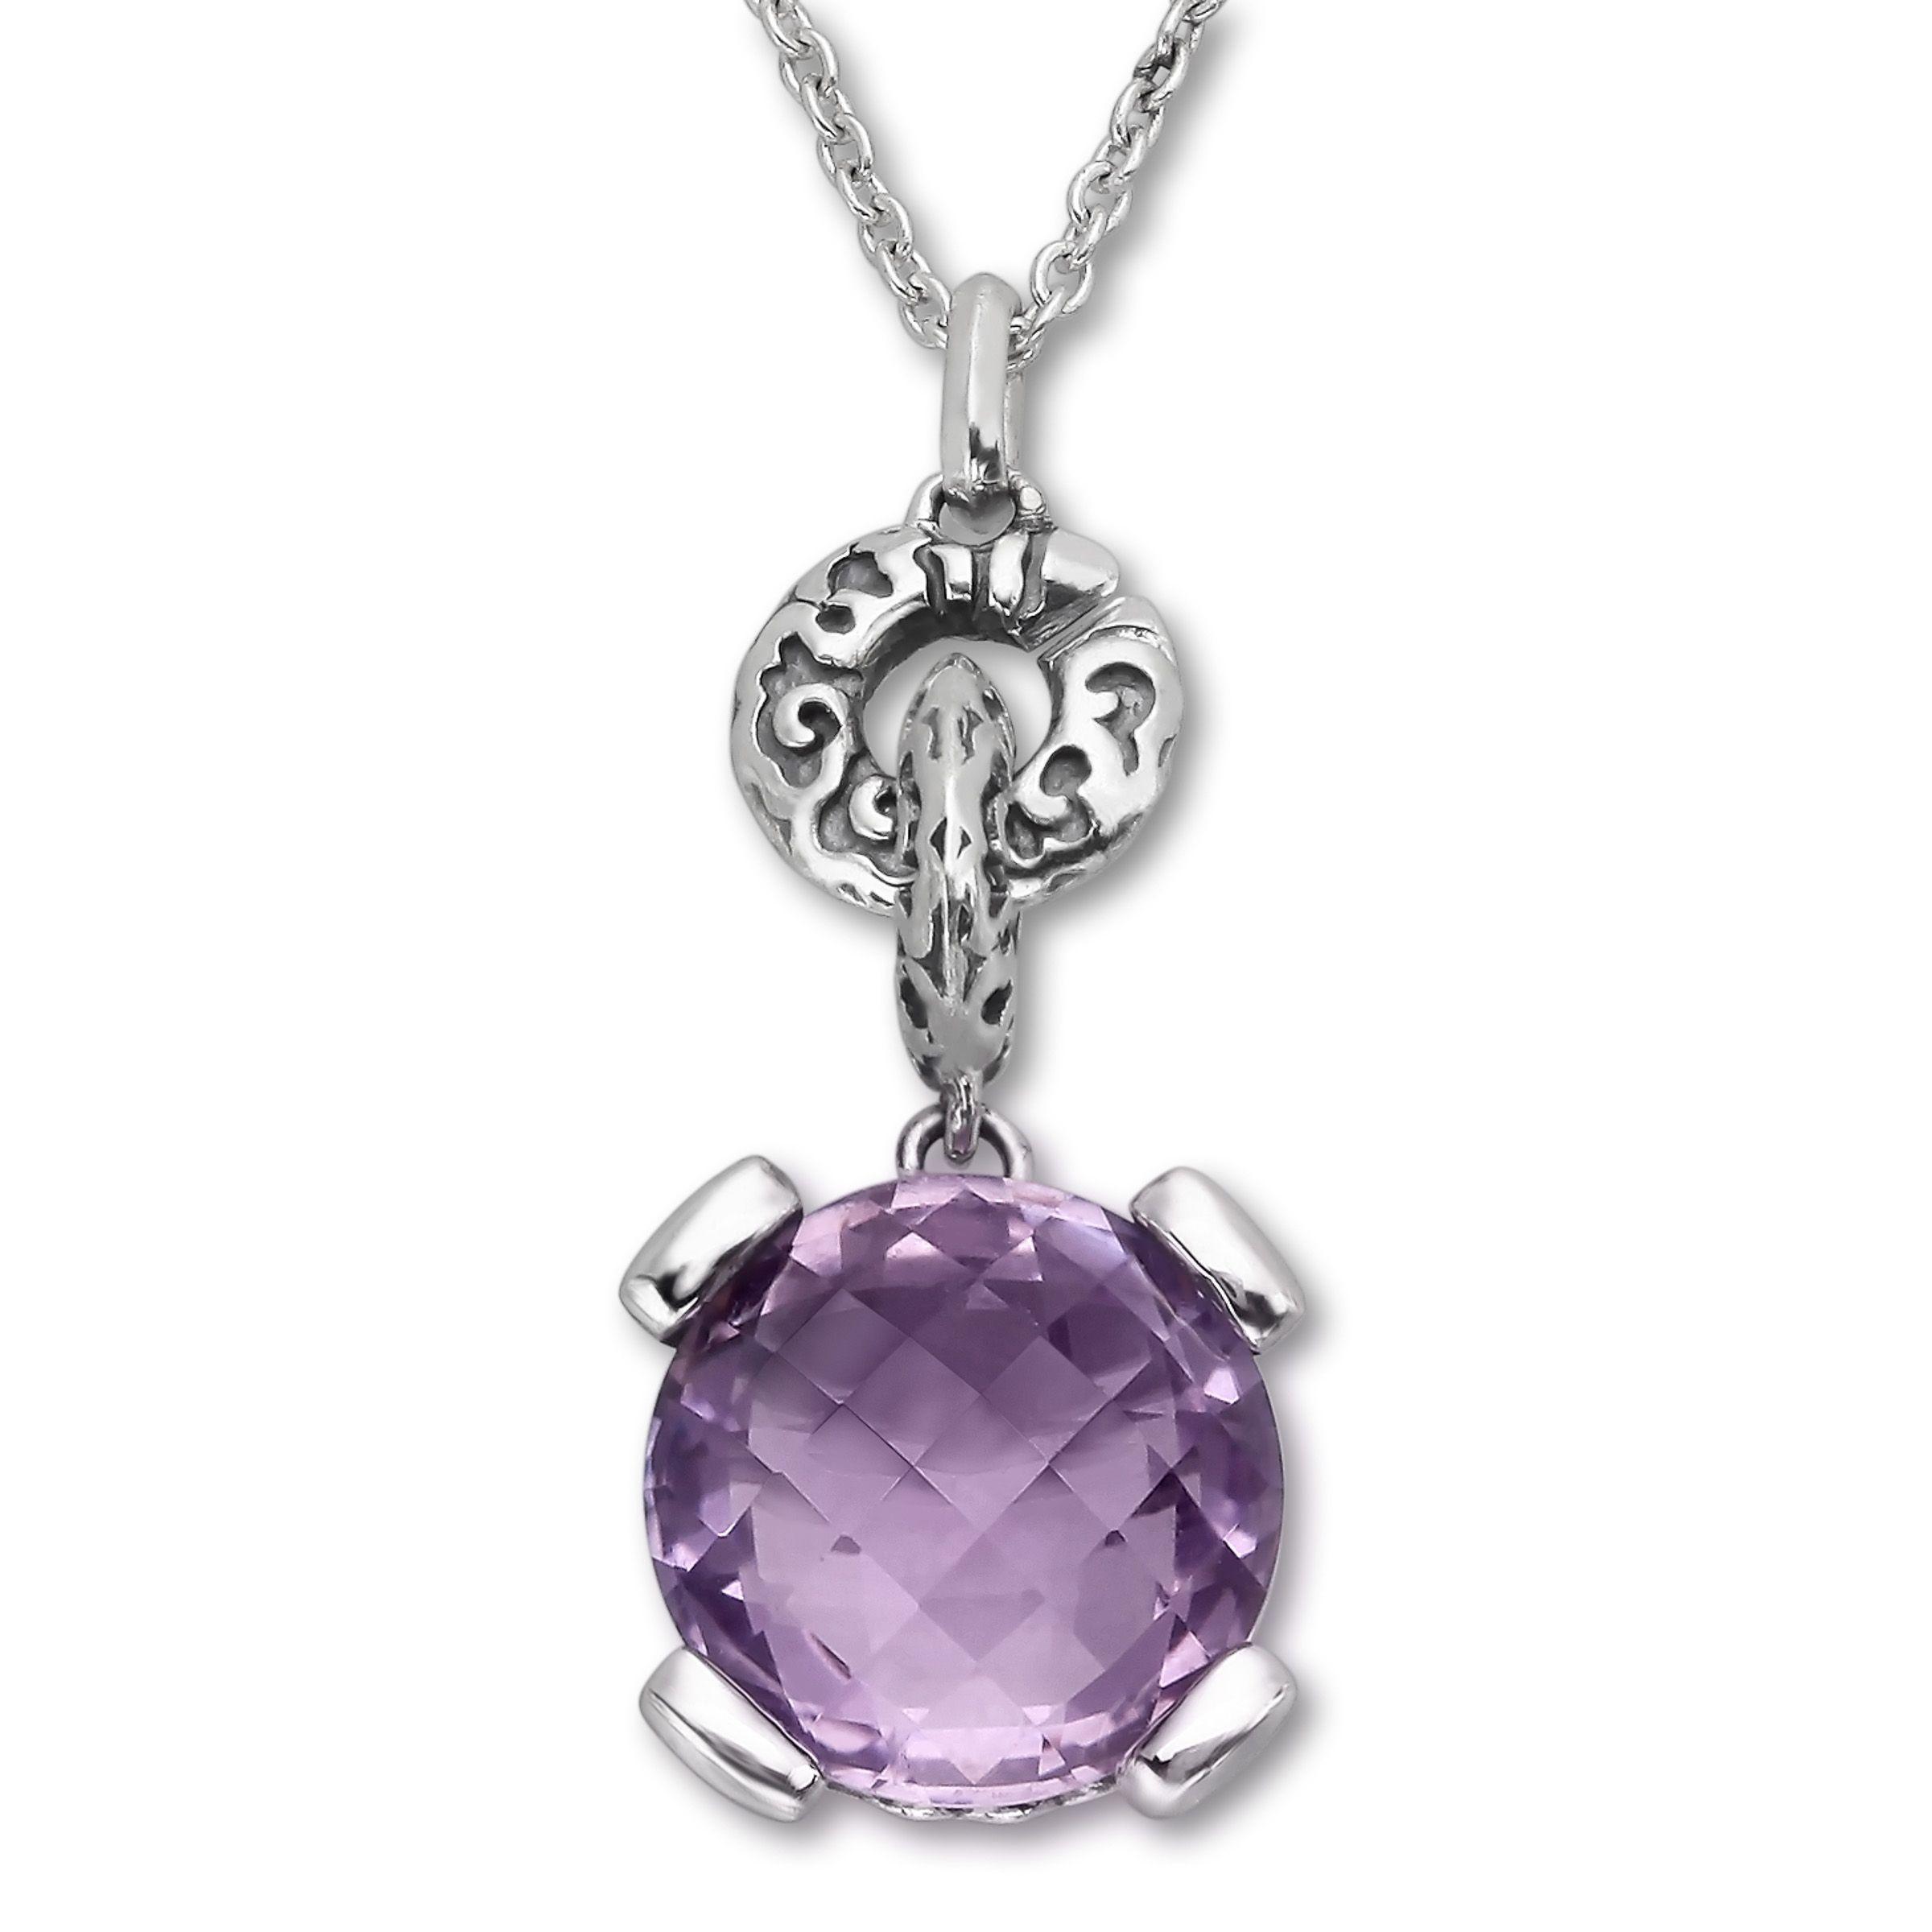 Evert degraeve 6 14 ct amethyst pendant in sterling silver evert degraeve 6 14 ct amethyst pendant in sterling silver aloadofball Images